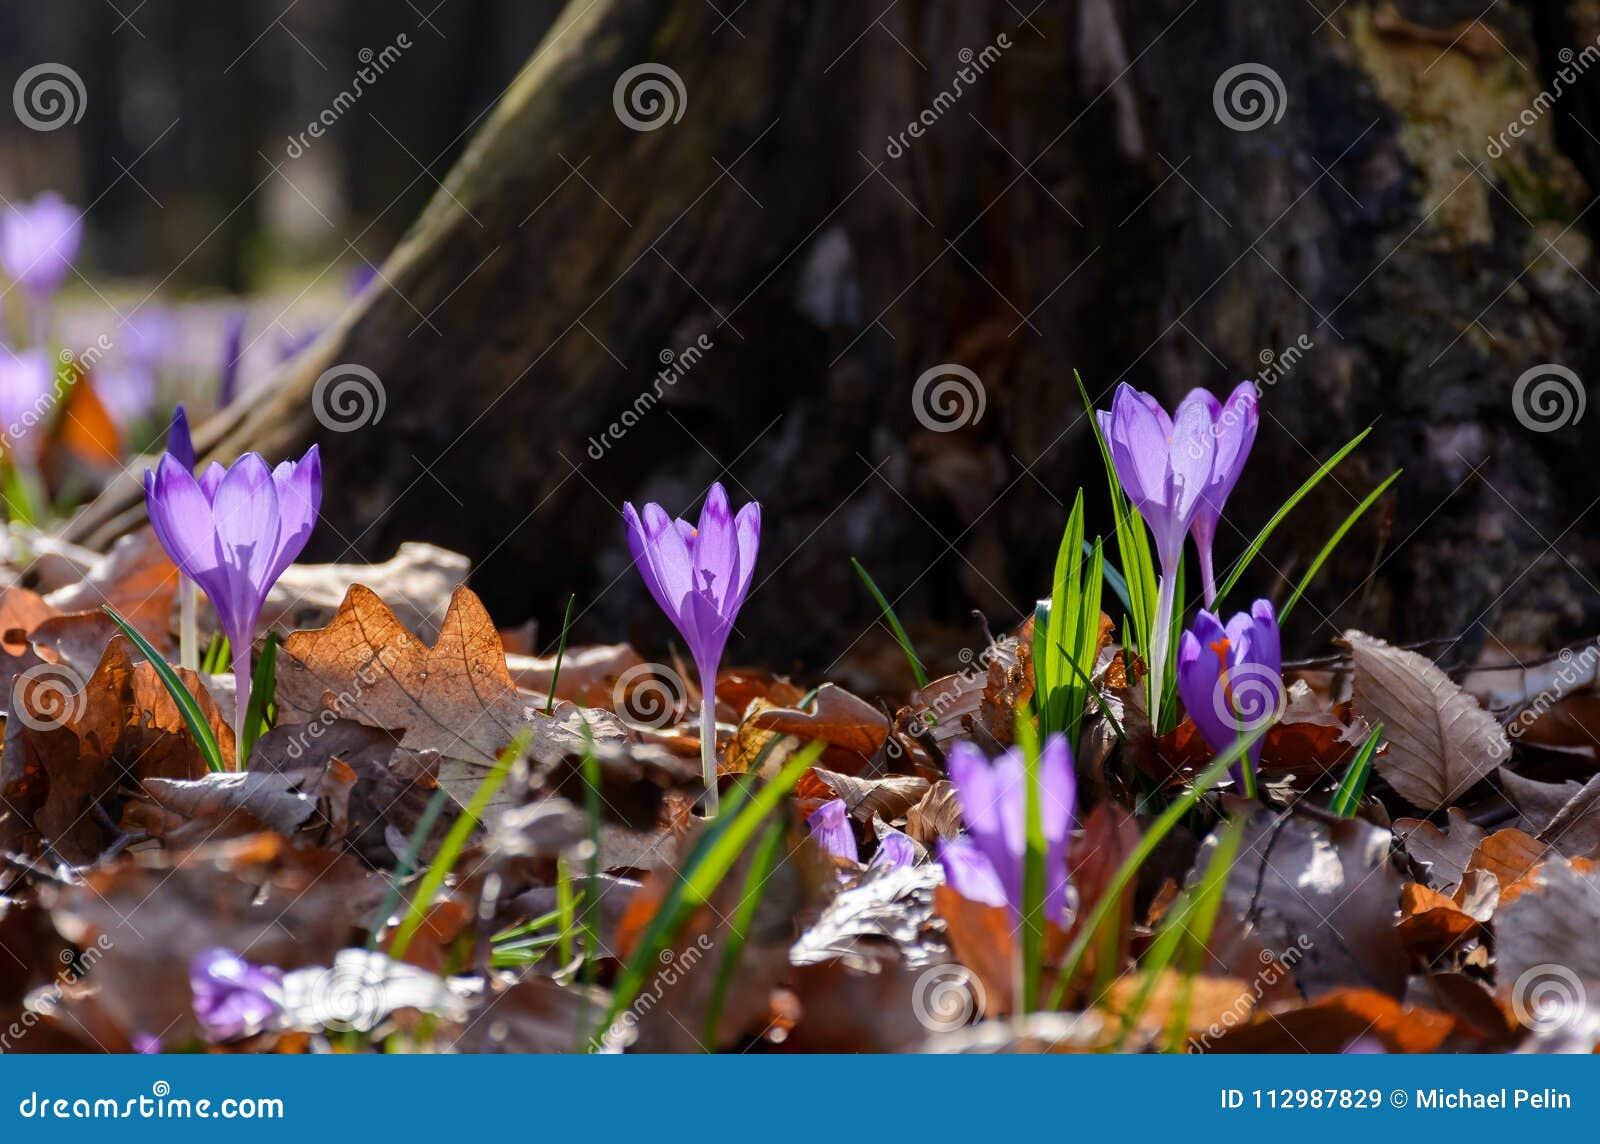 Purple crocus flowers near the stump